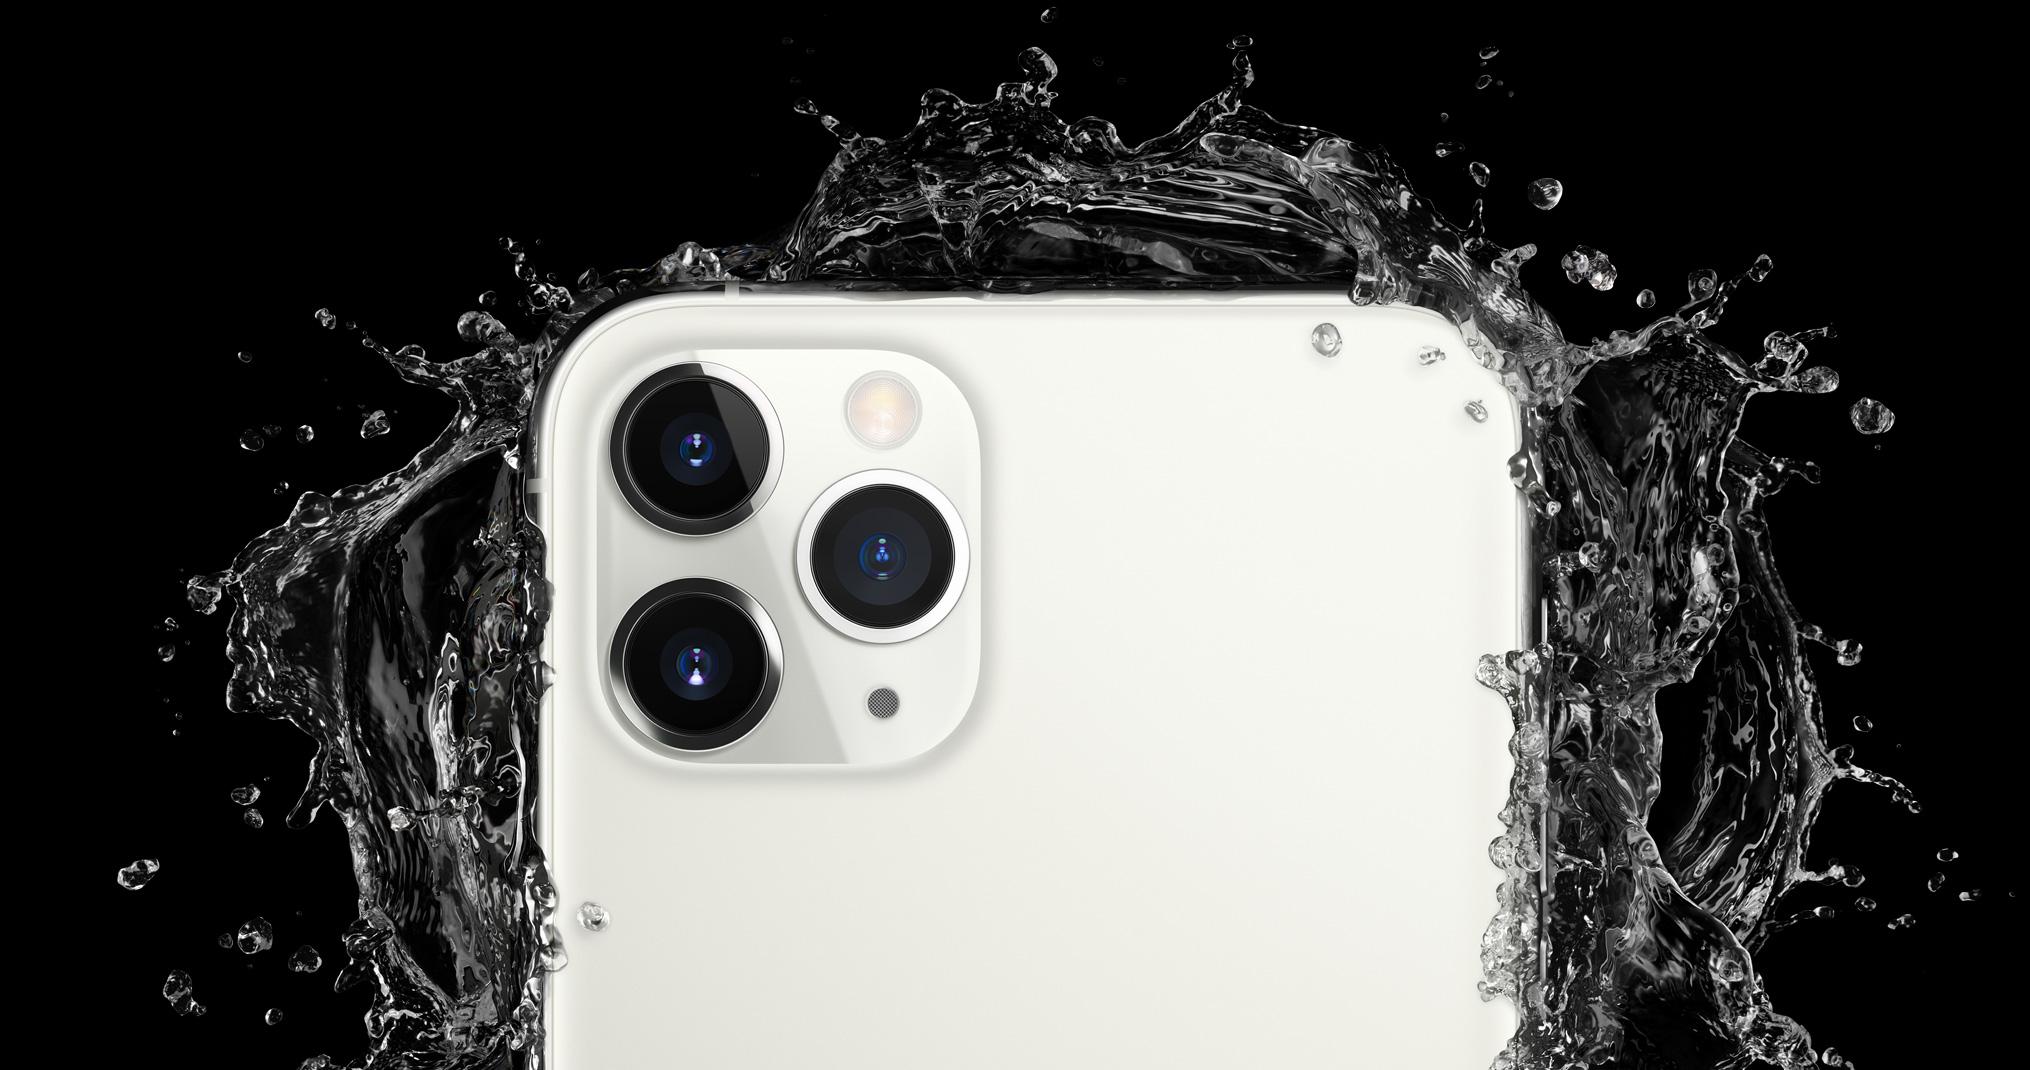 splashes__d3a02nzl9p4y_large.jpg (2030×1070)